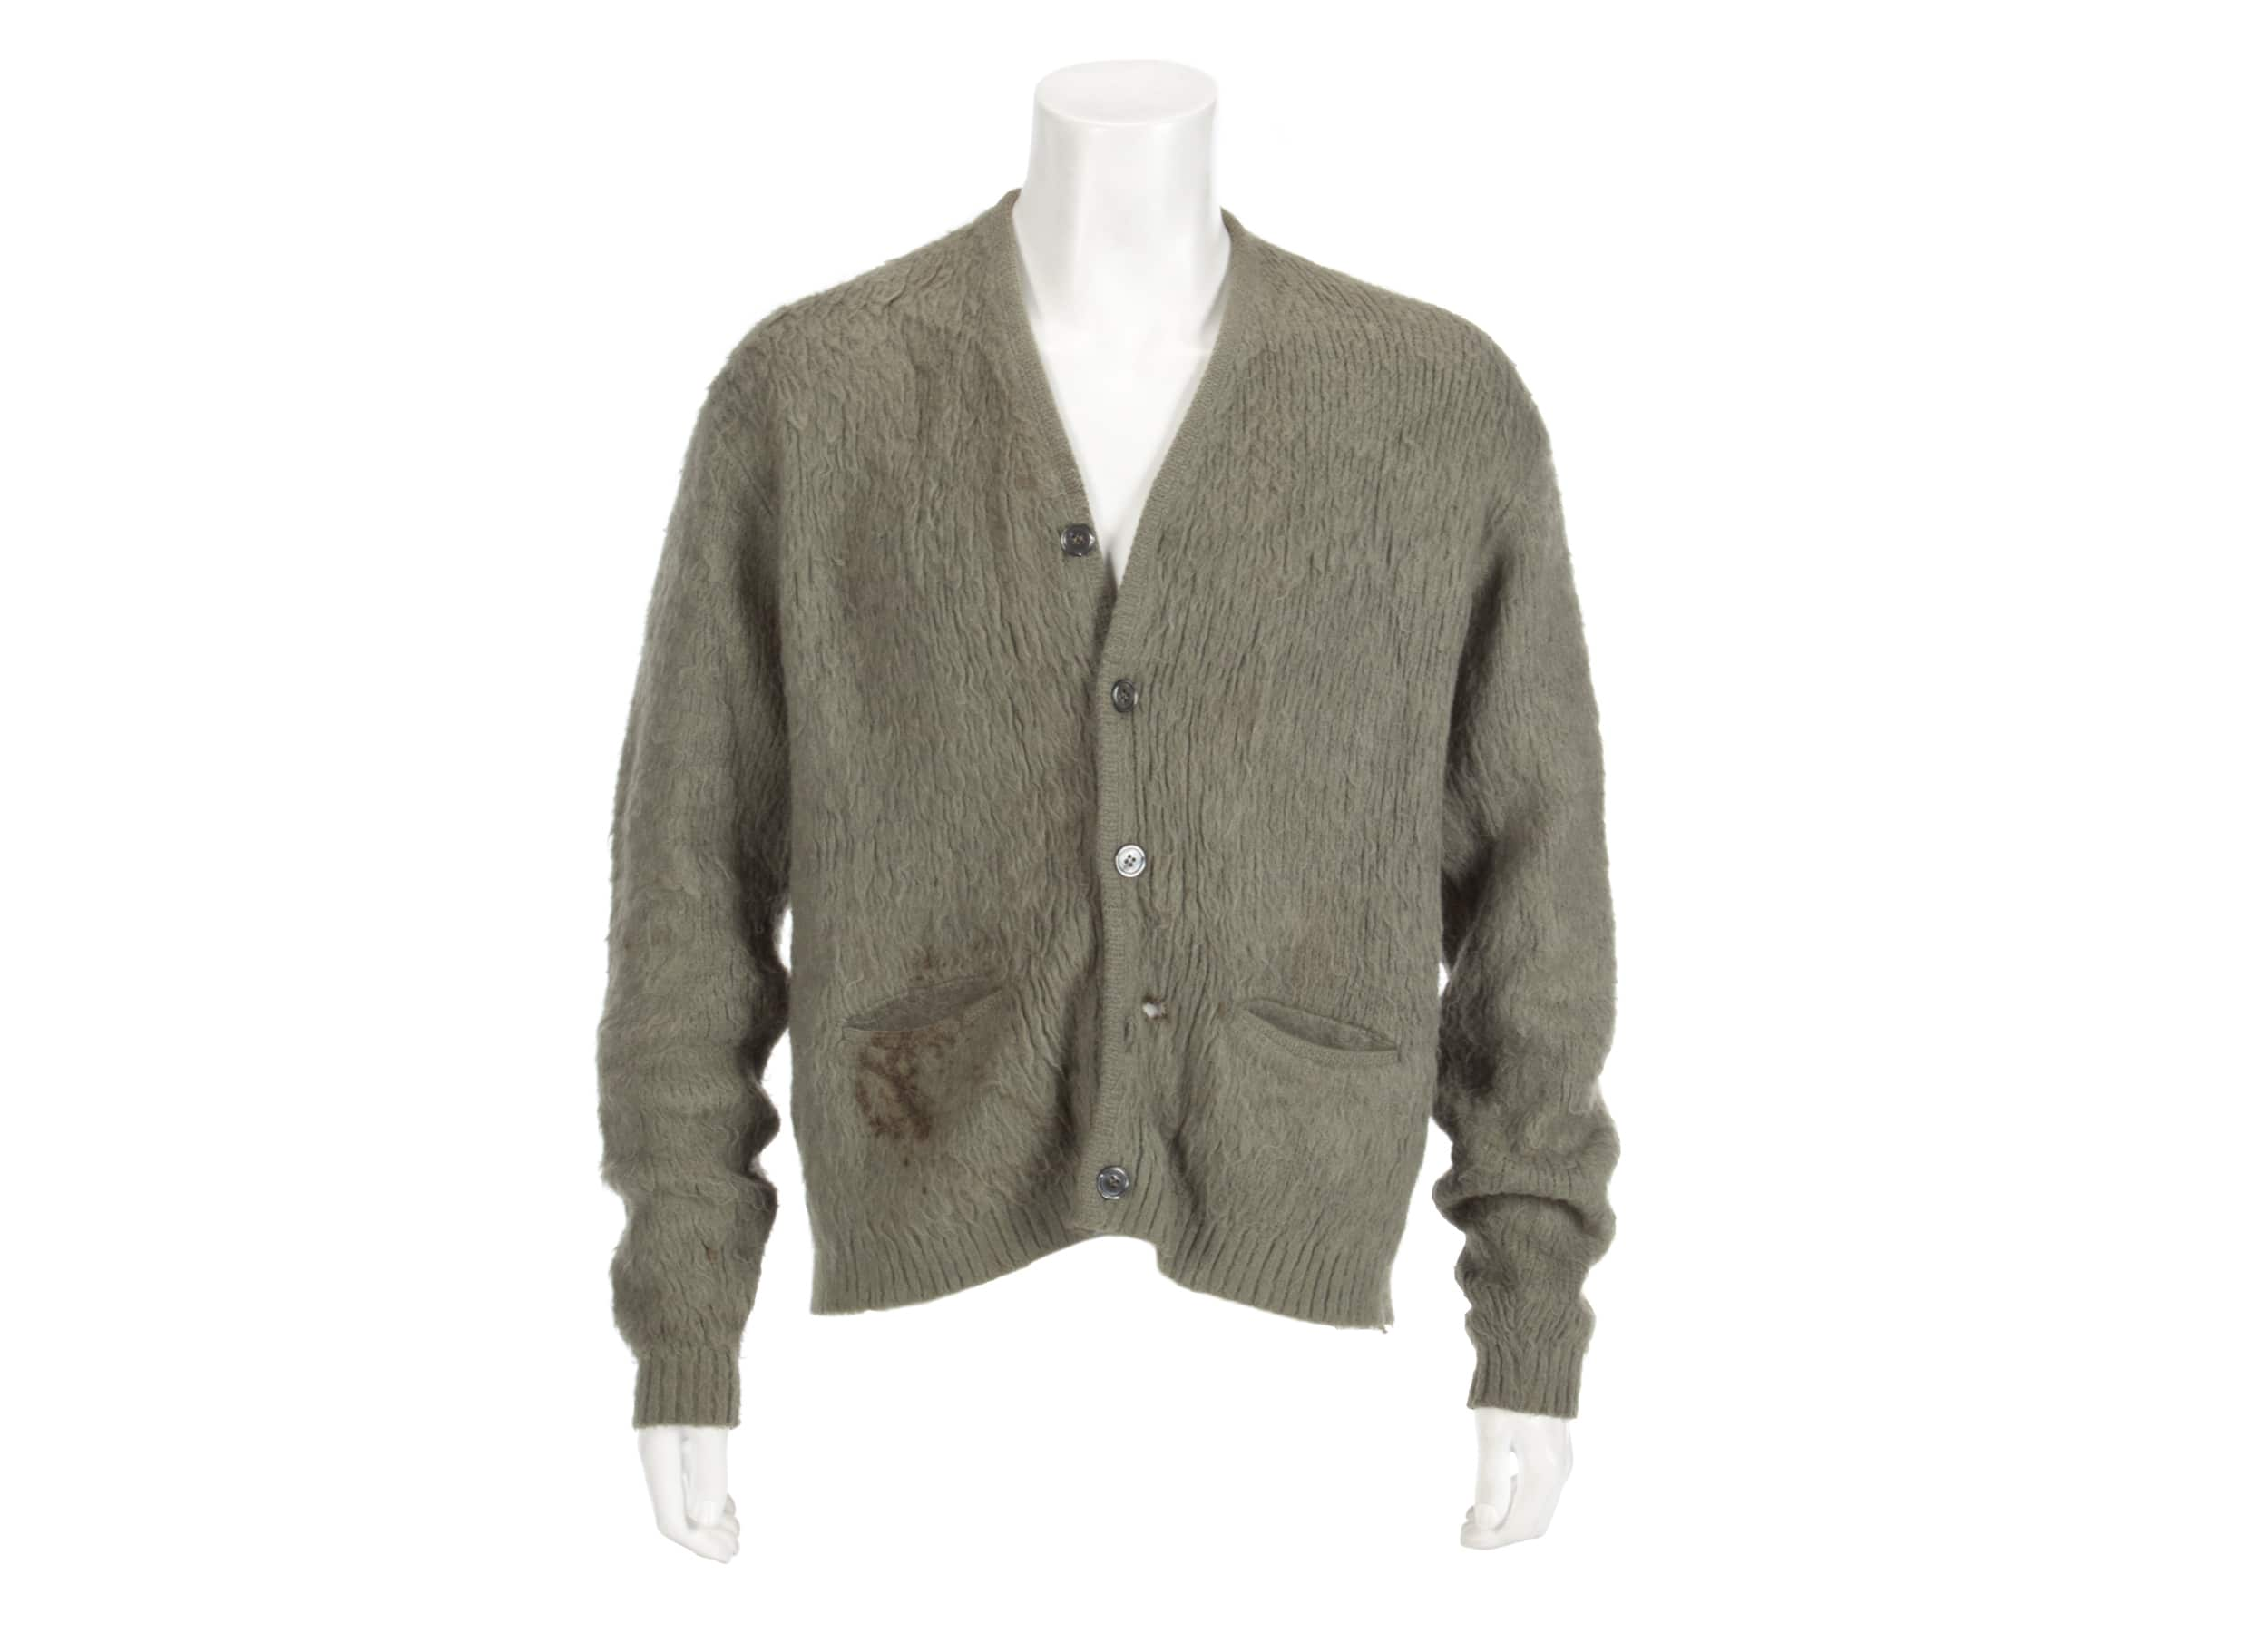 Photo of the green cardigan worn by Nirvana frontman Kurt Cobain